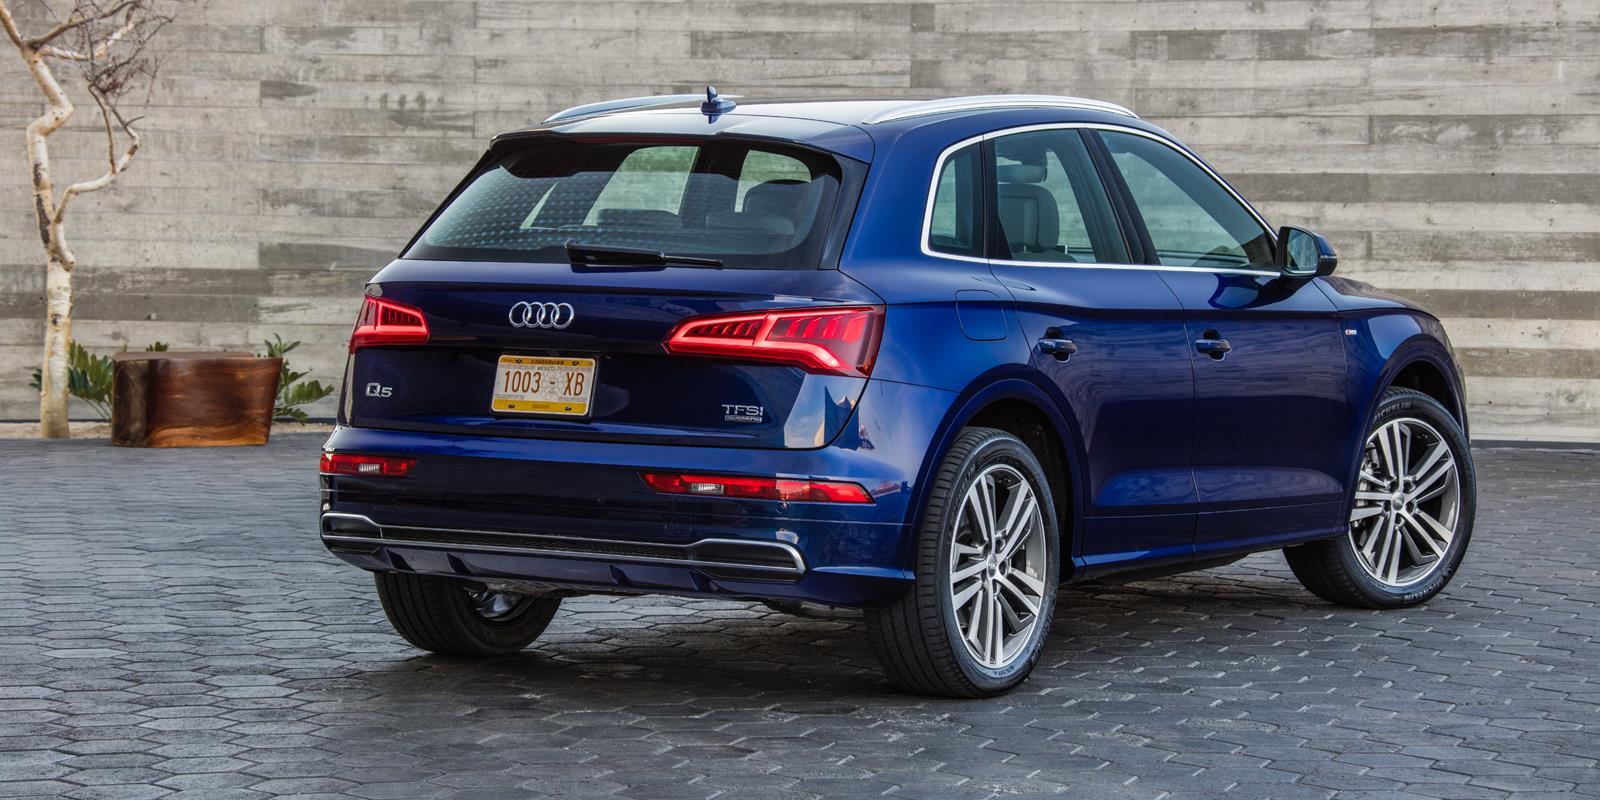 Audi Q5 photo 171912